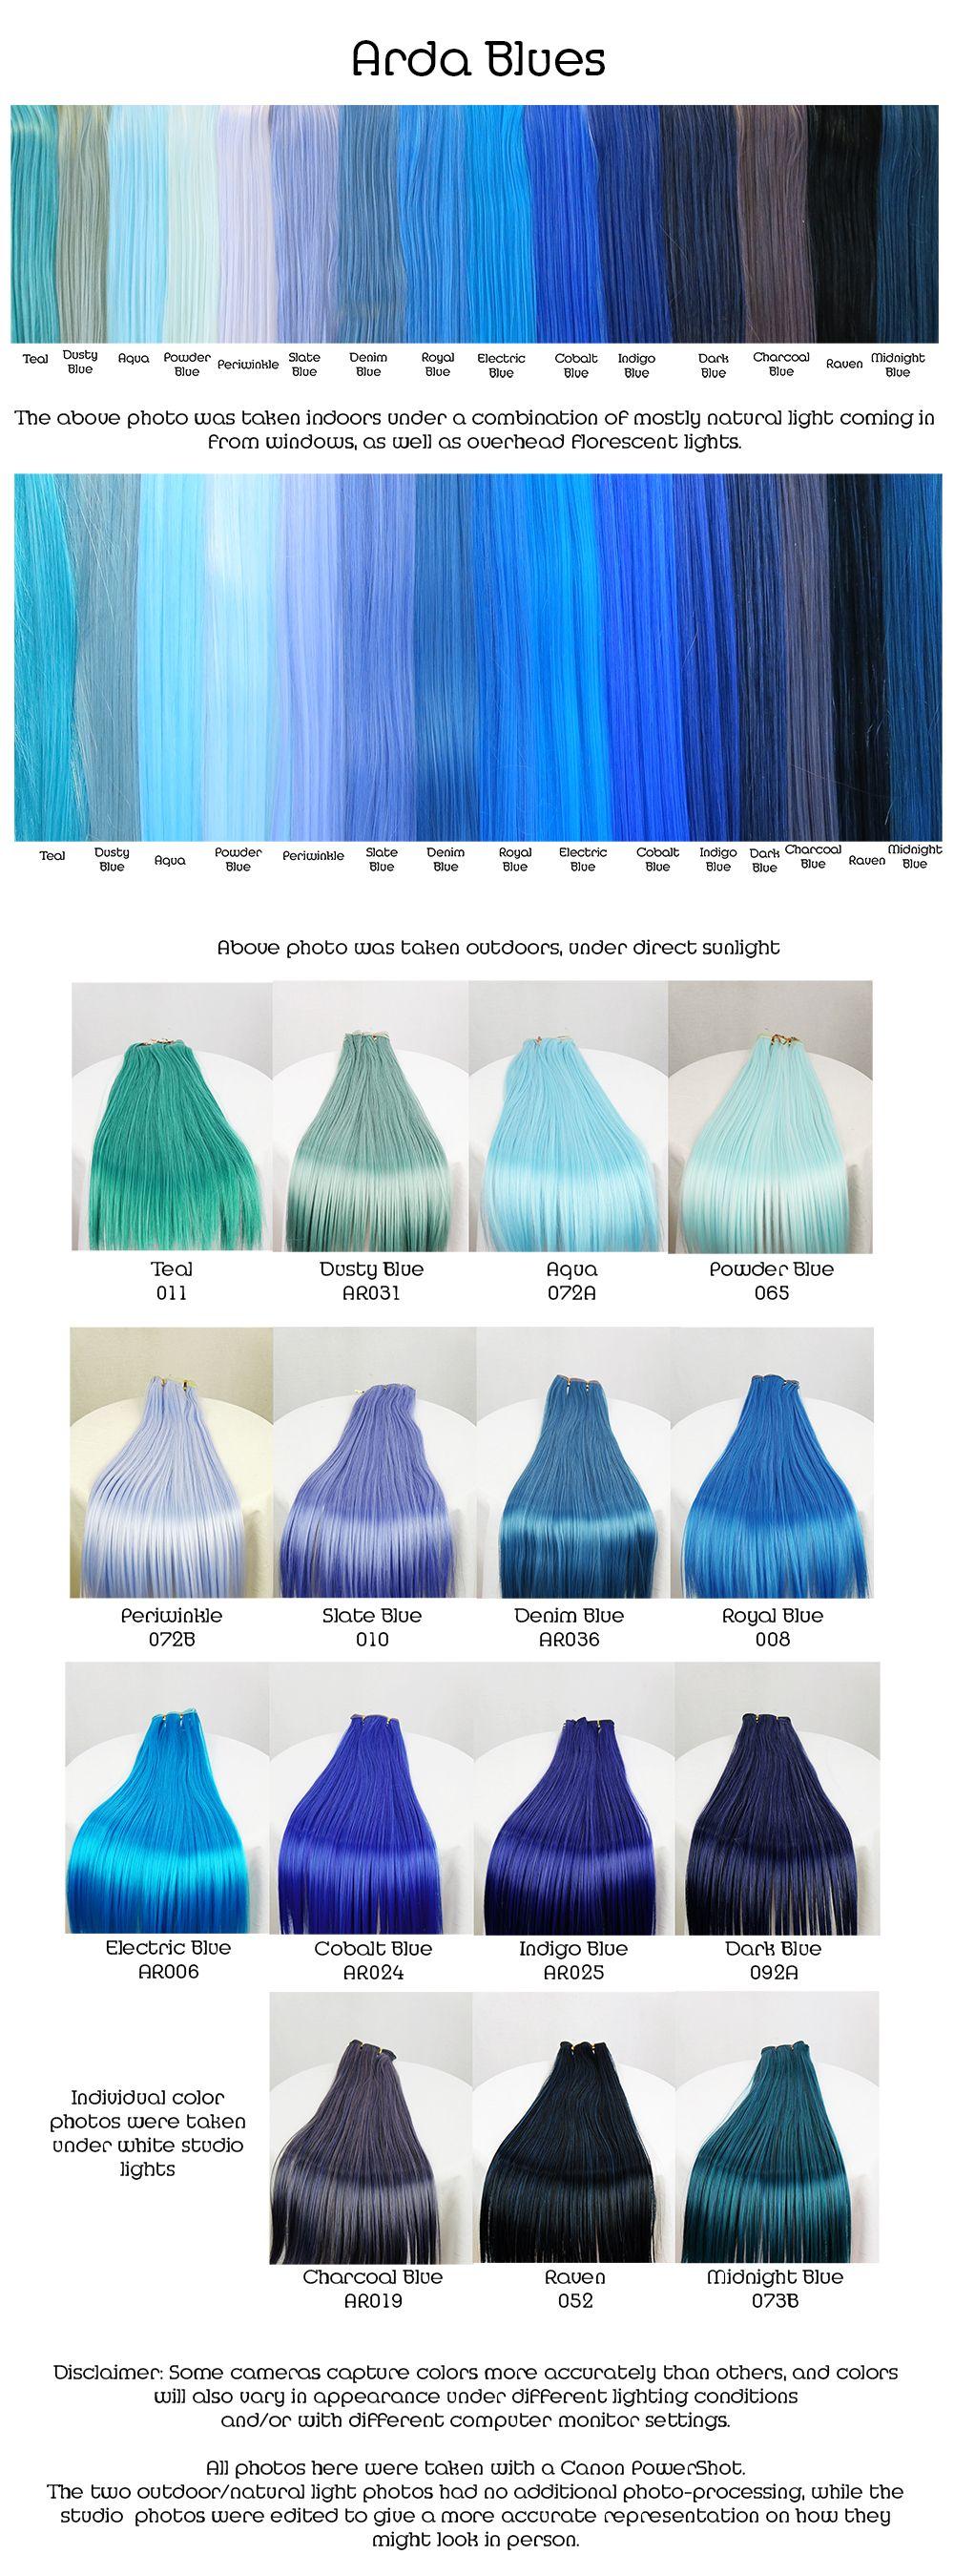 Color chart for wigs - Arda Blues Wig Fiber Color Pallette